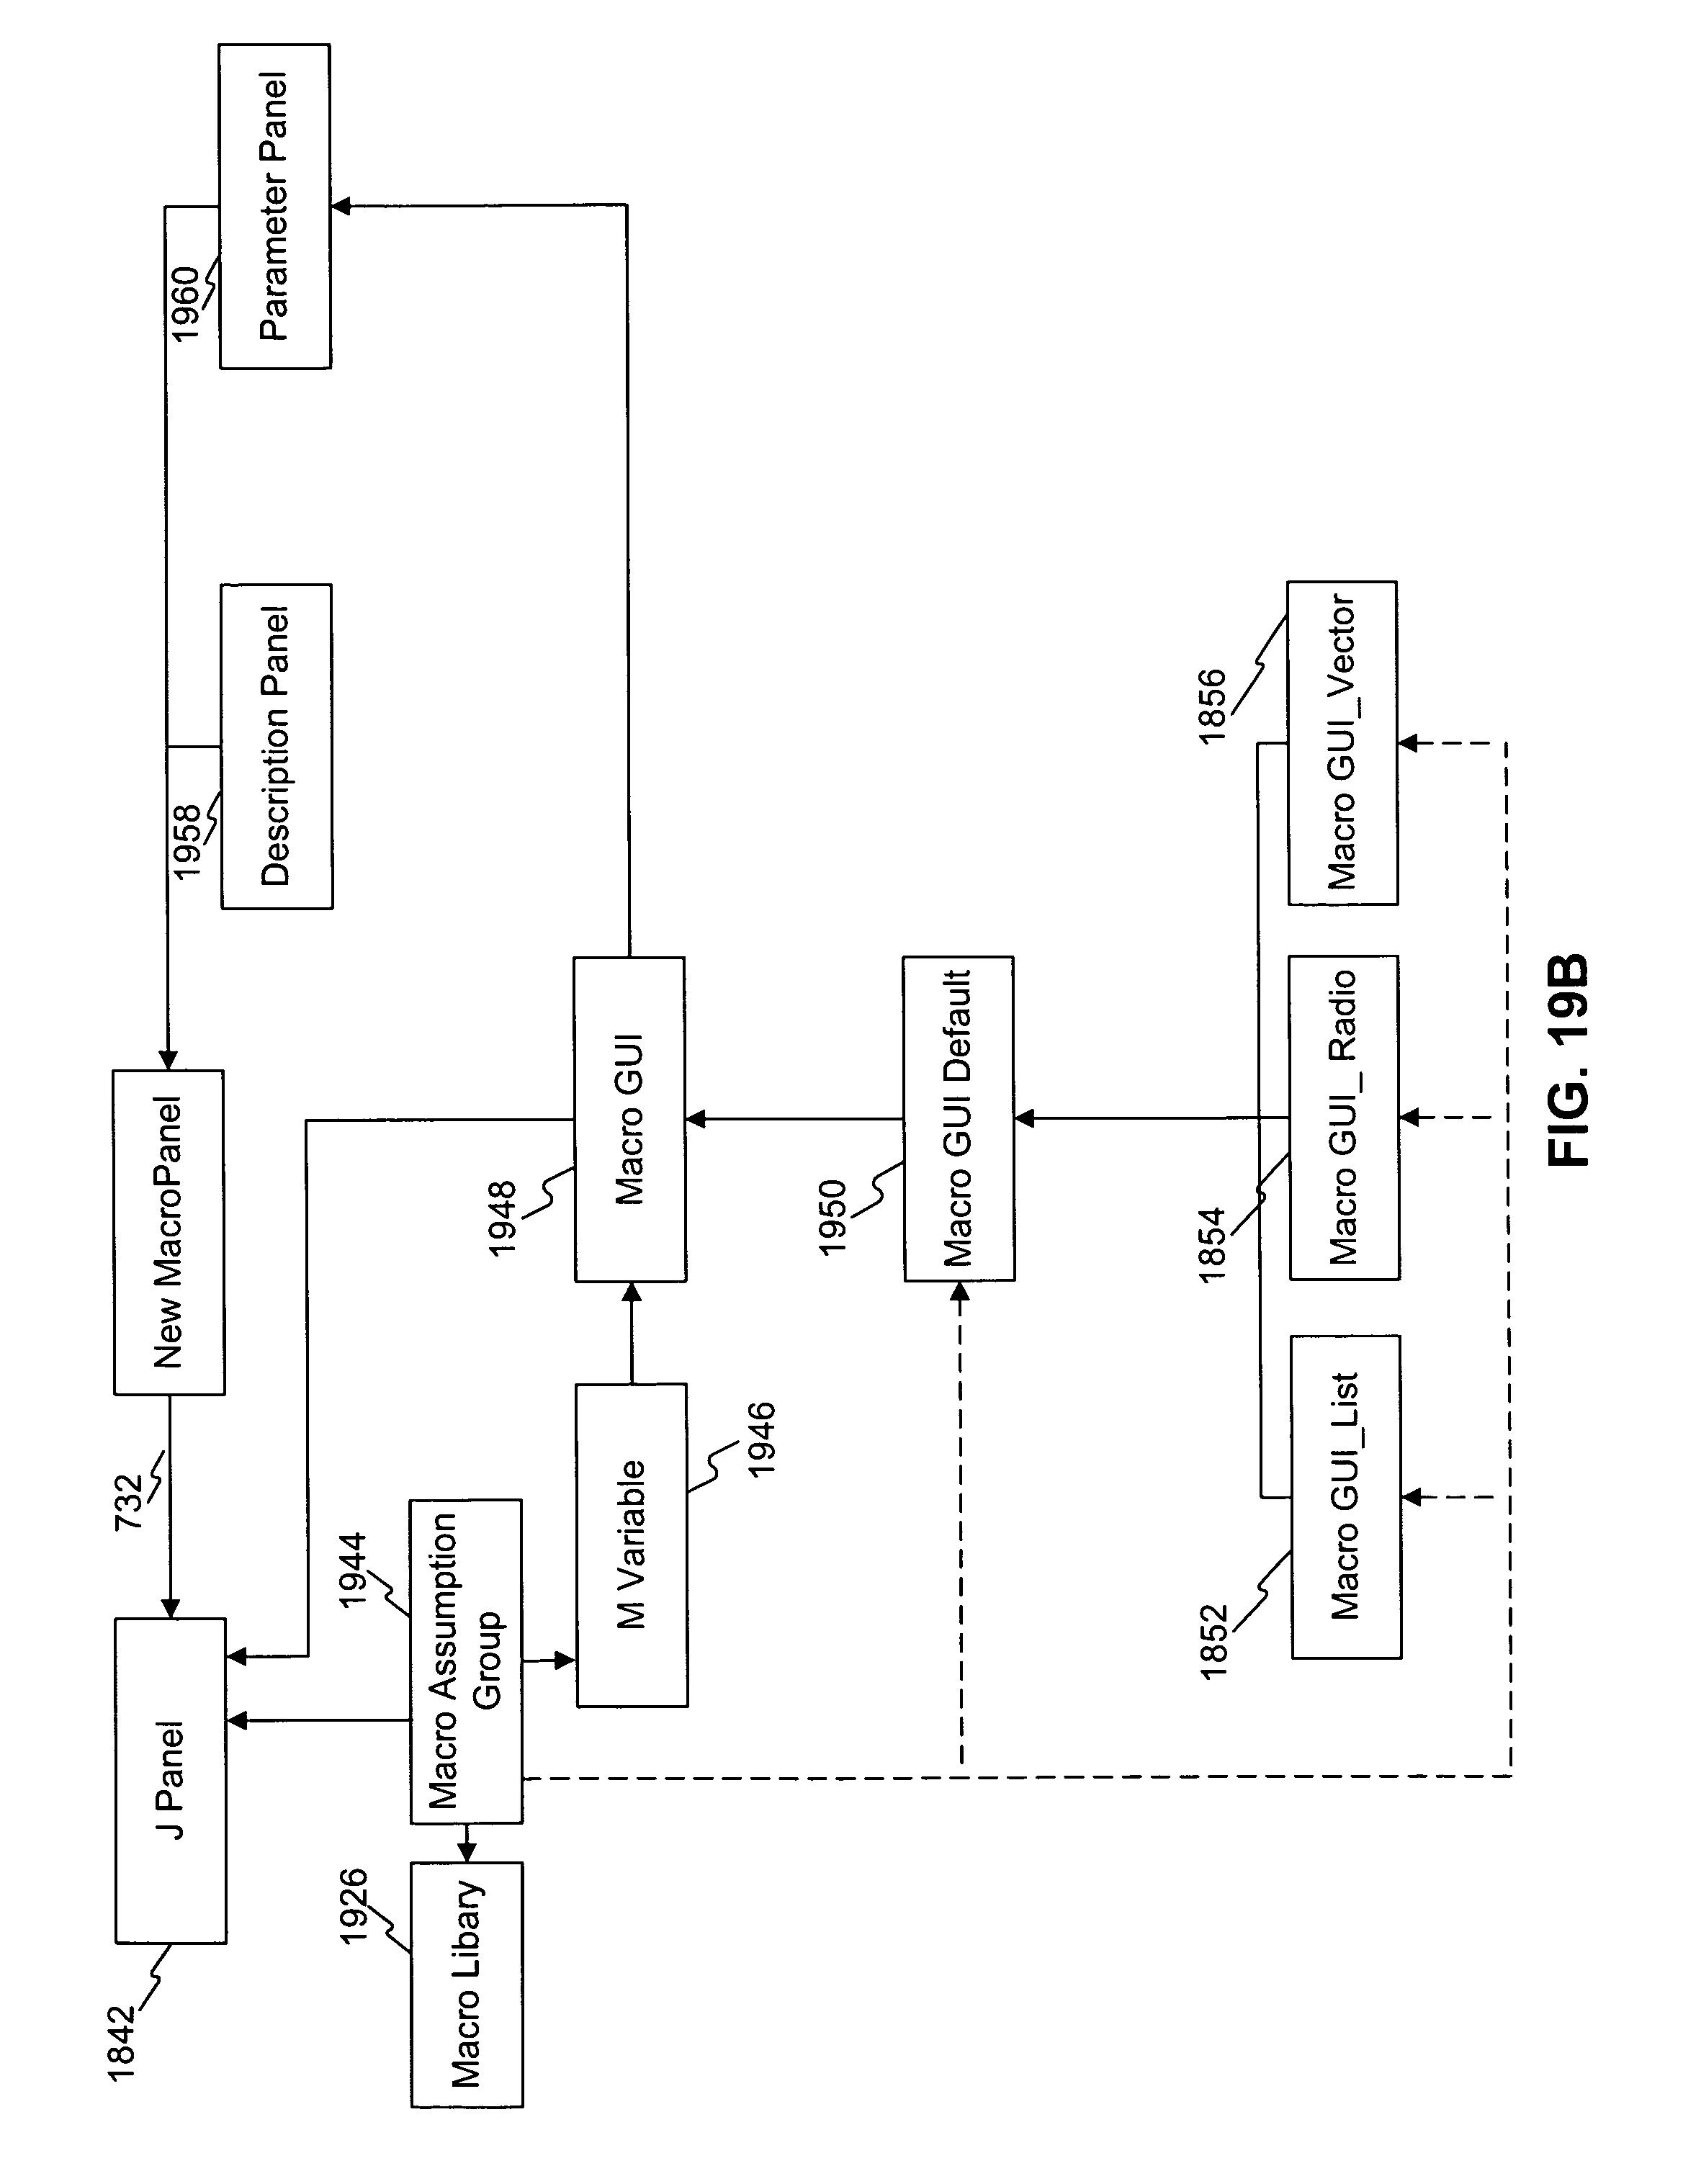 1 1 28 database architecture likewise US20040006563 further Sql Language Statement Types additionally US6778949 moreover US8185816. on data manipulation language